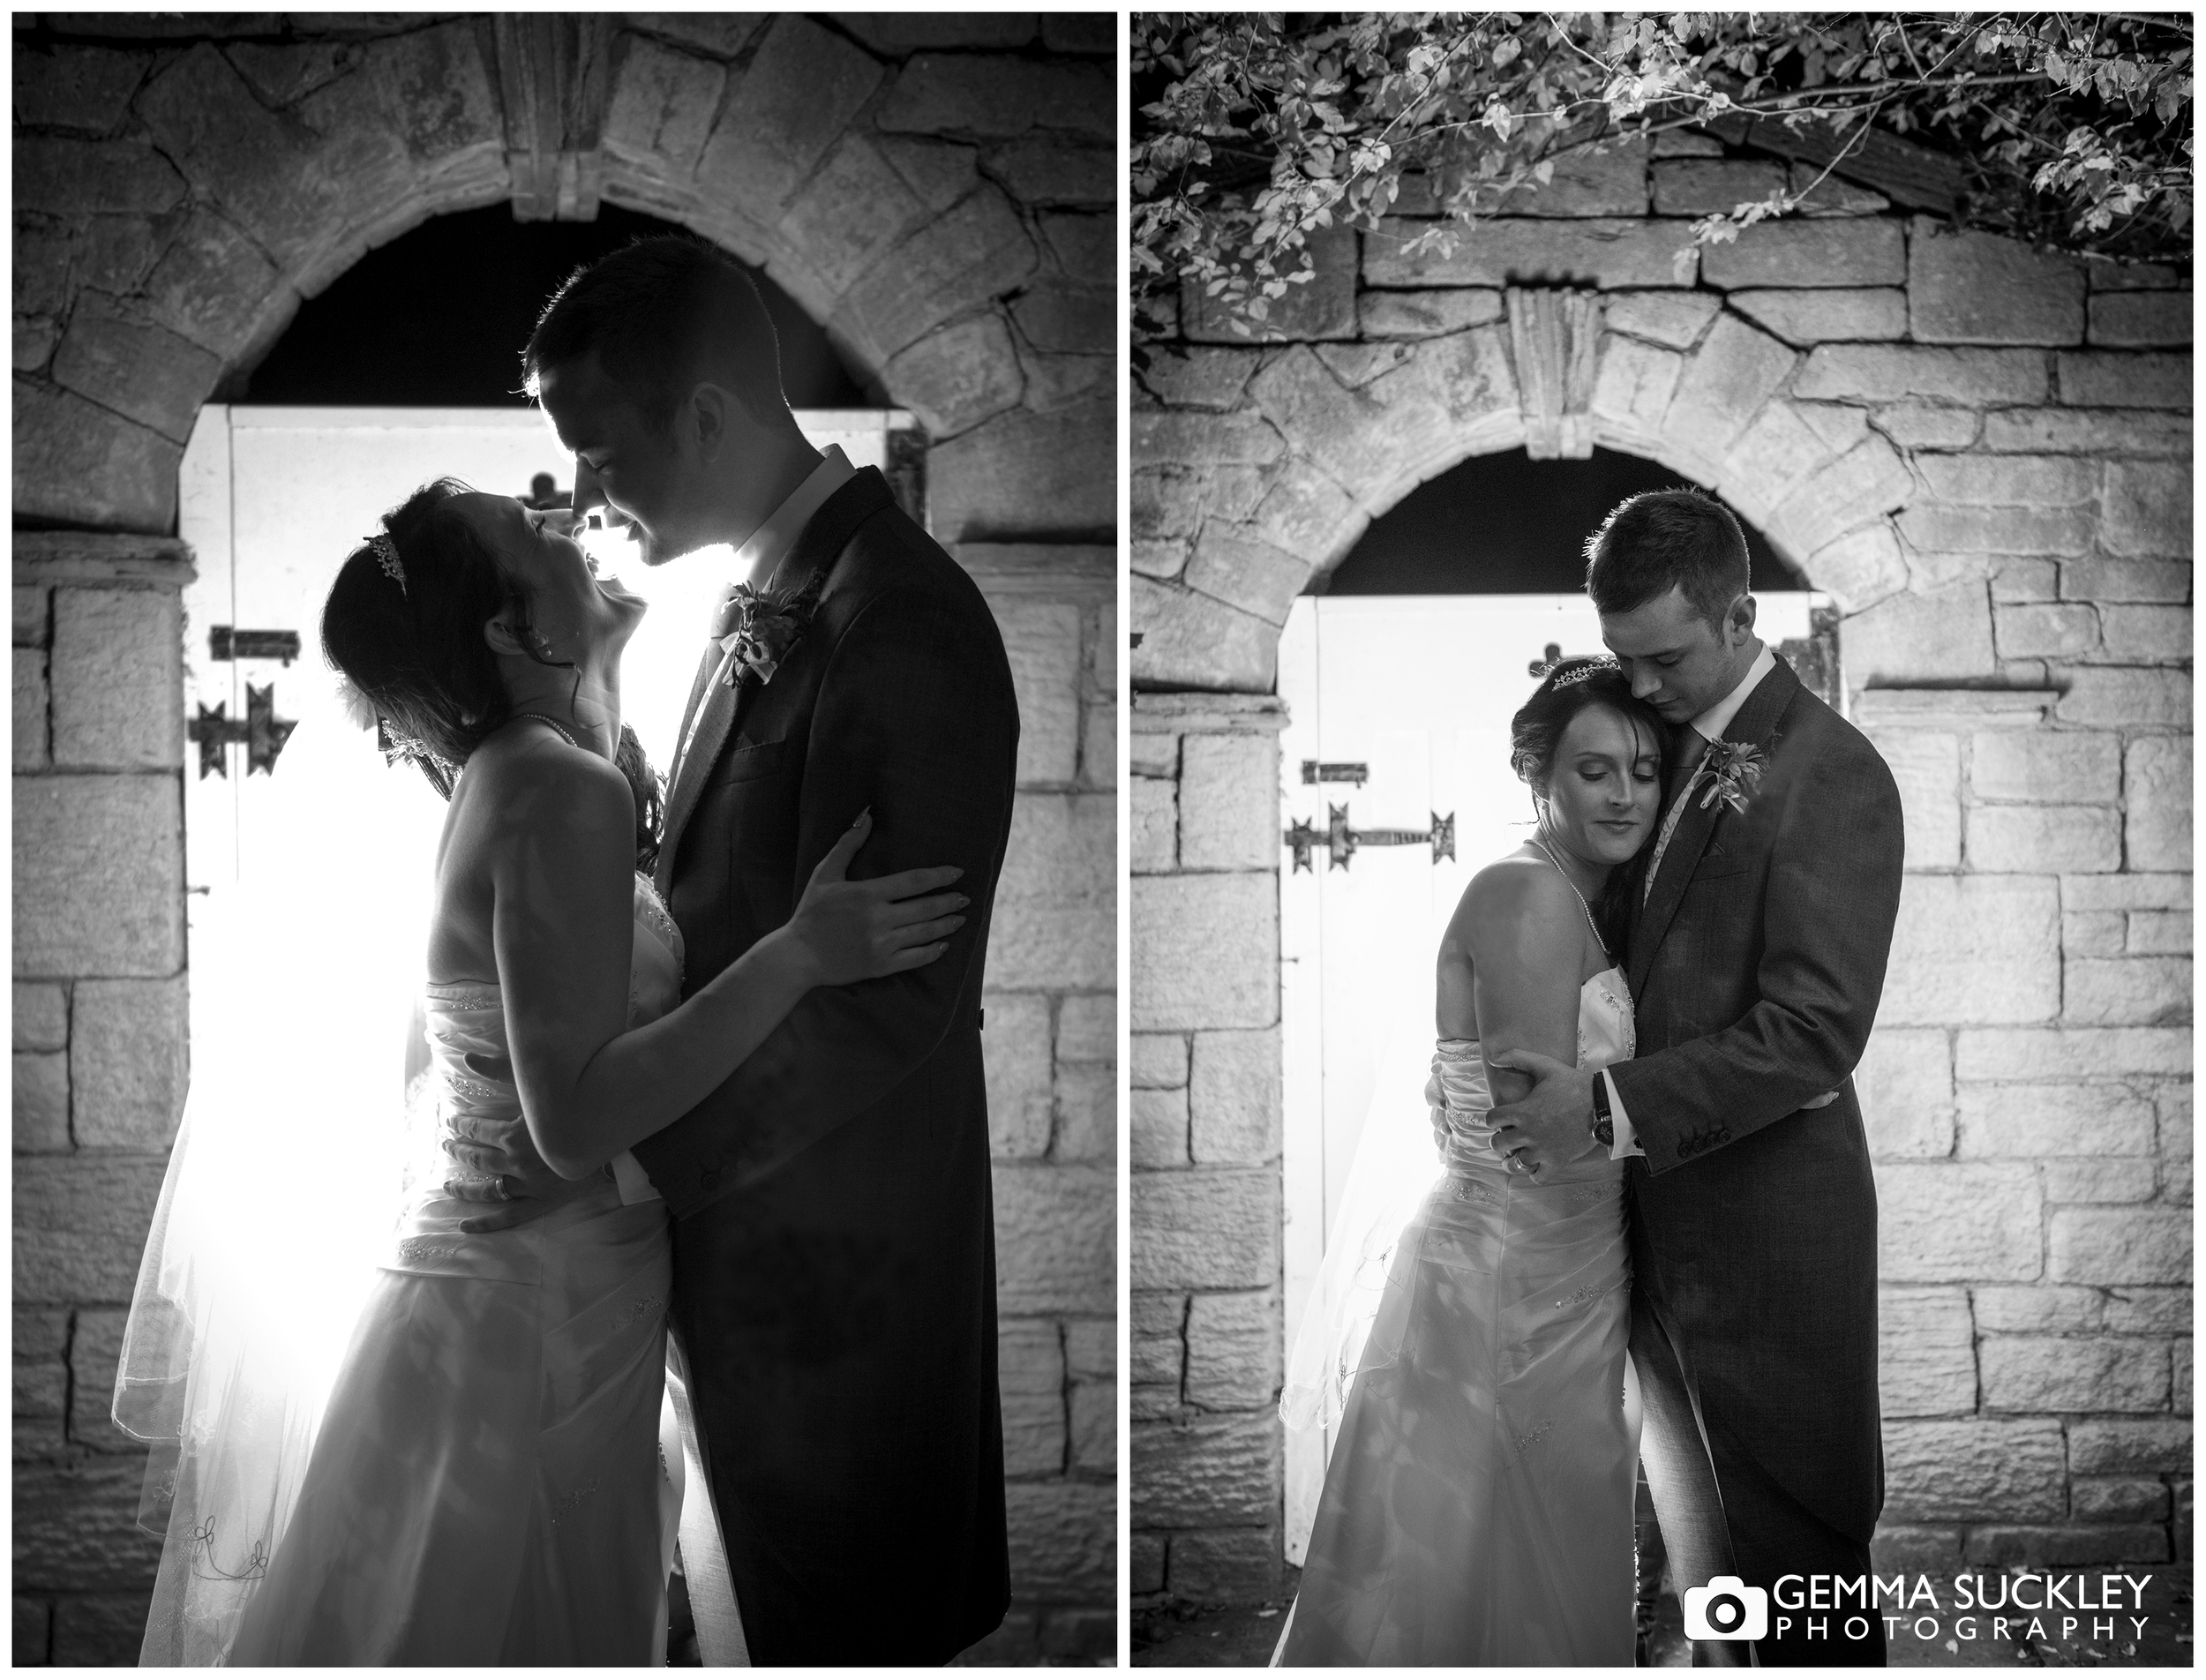 night-portraits-baildon-weddings.jpg